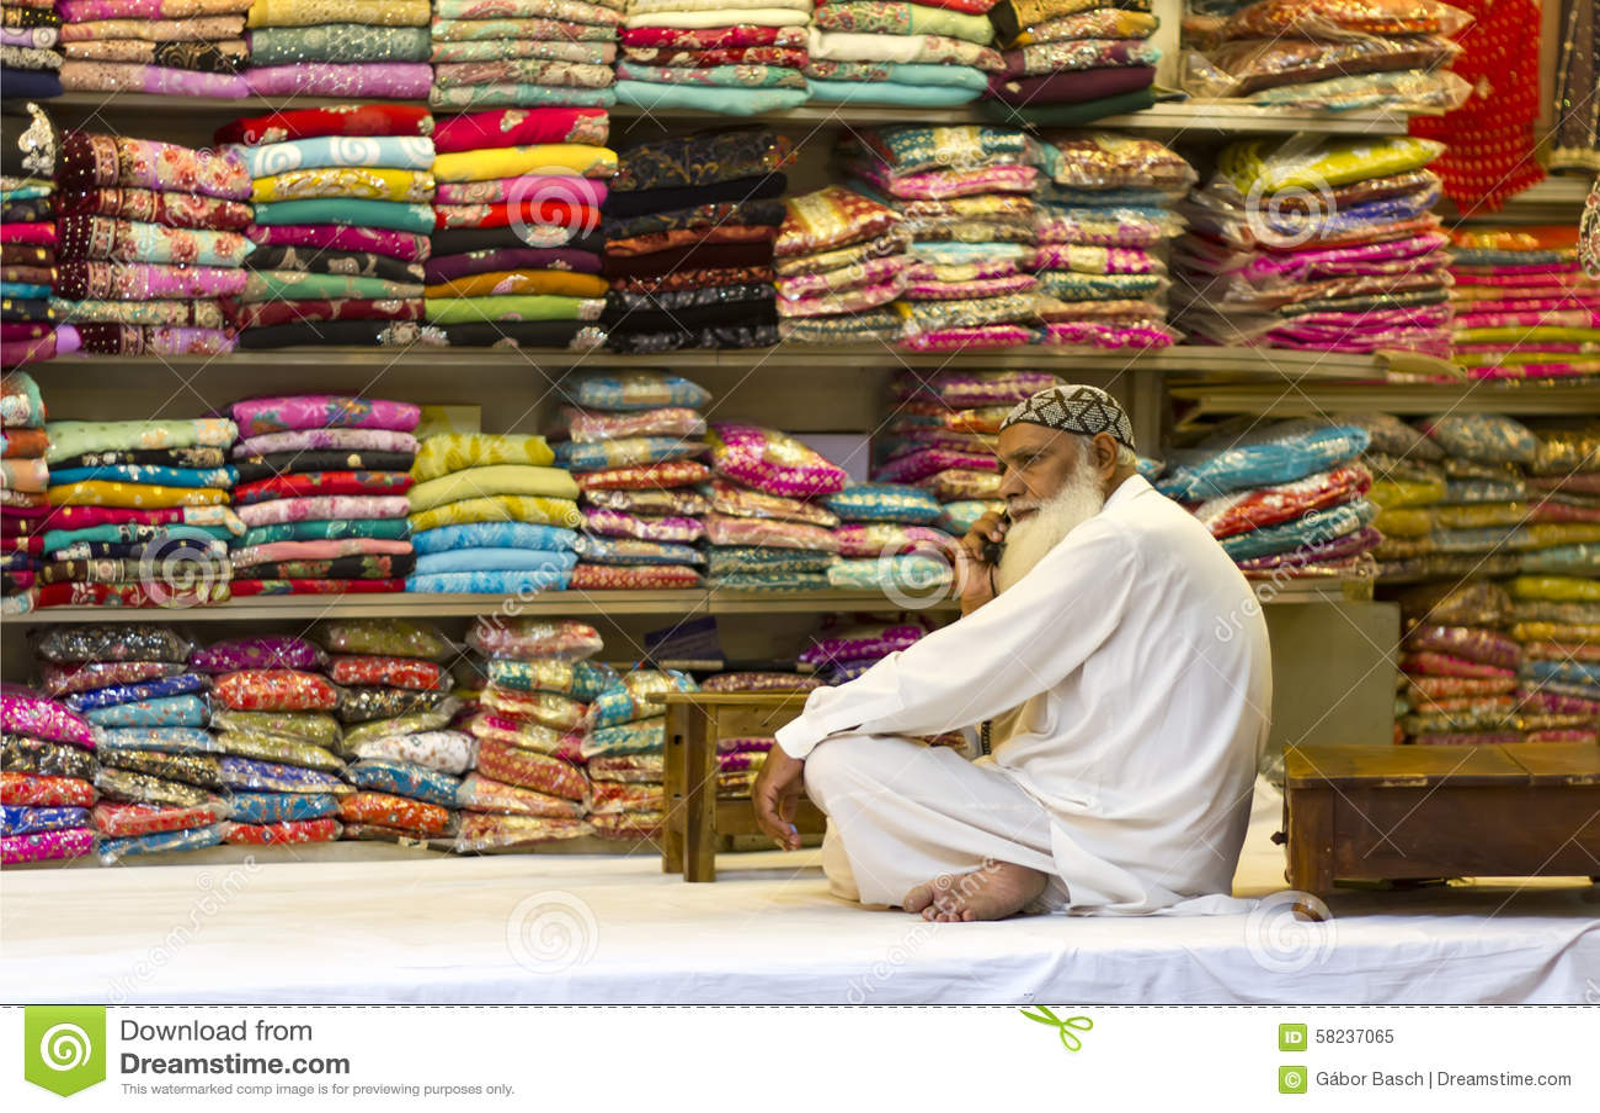 Textile vendor at the bazaar editorial image image 58237065 for Bano bazar anarkali lahore